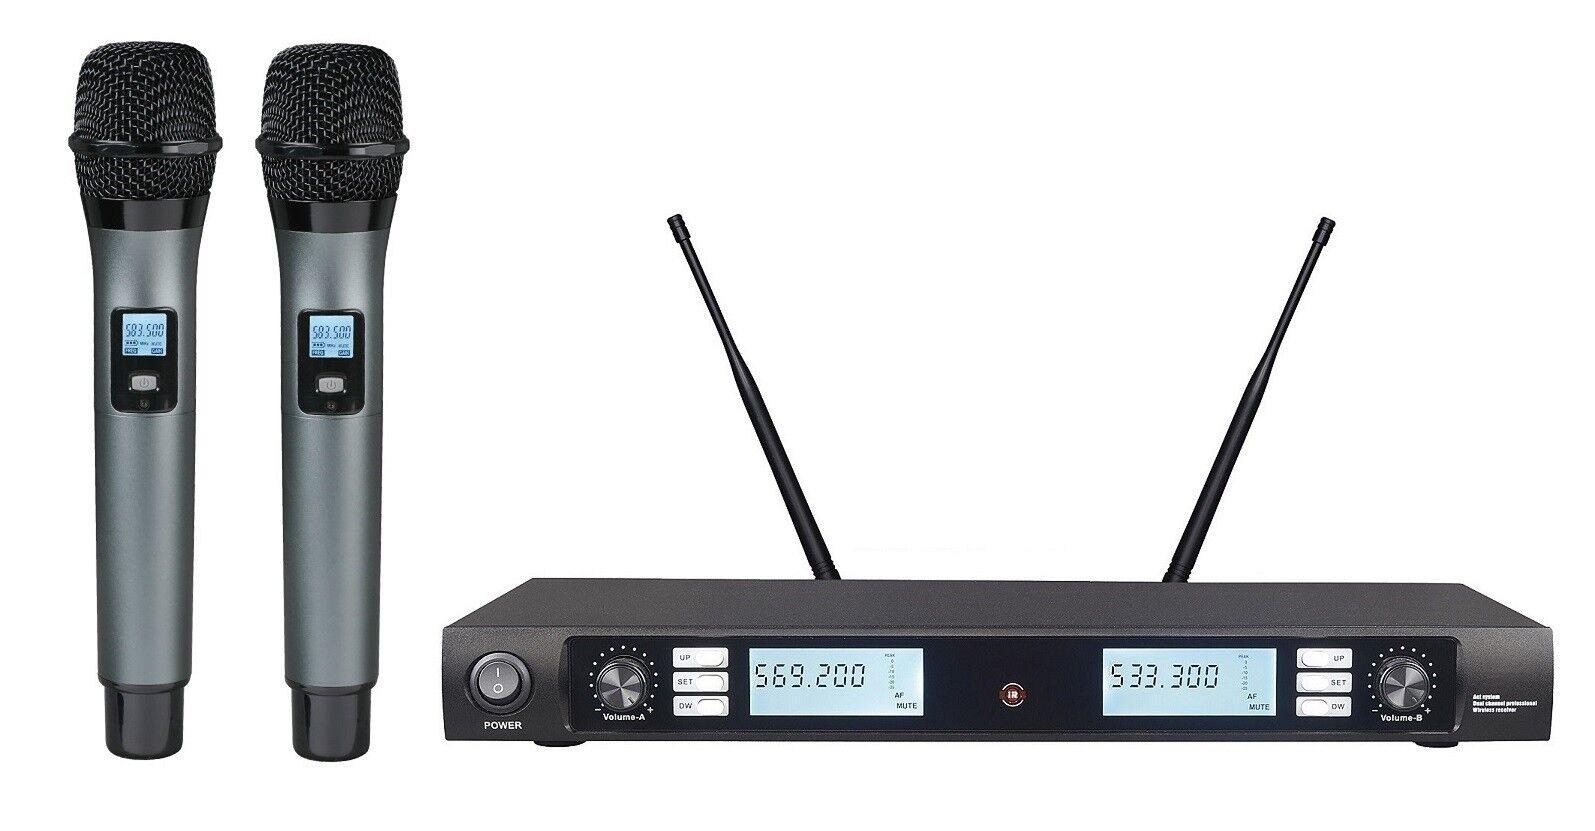 Professional UHF Wireless Cordless Microphone mic System Karaoke Microphone Set